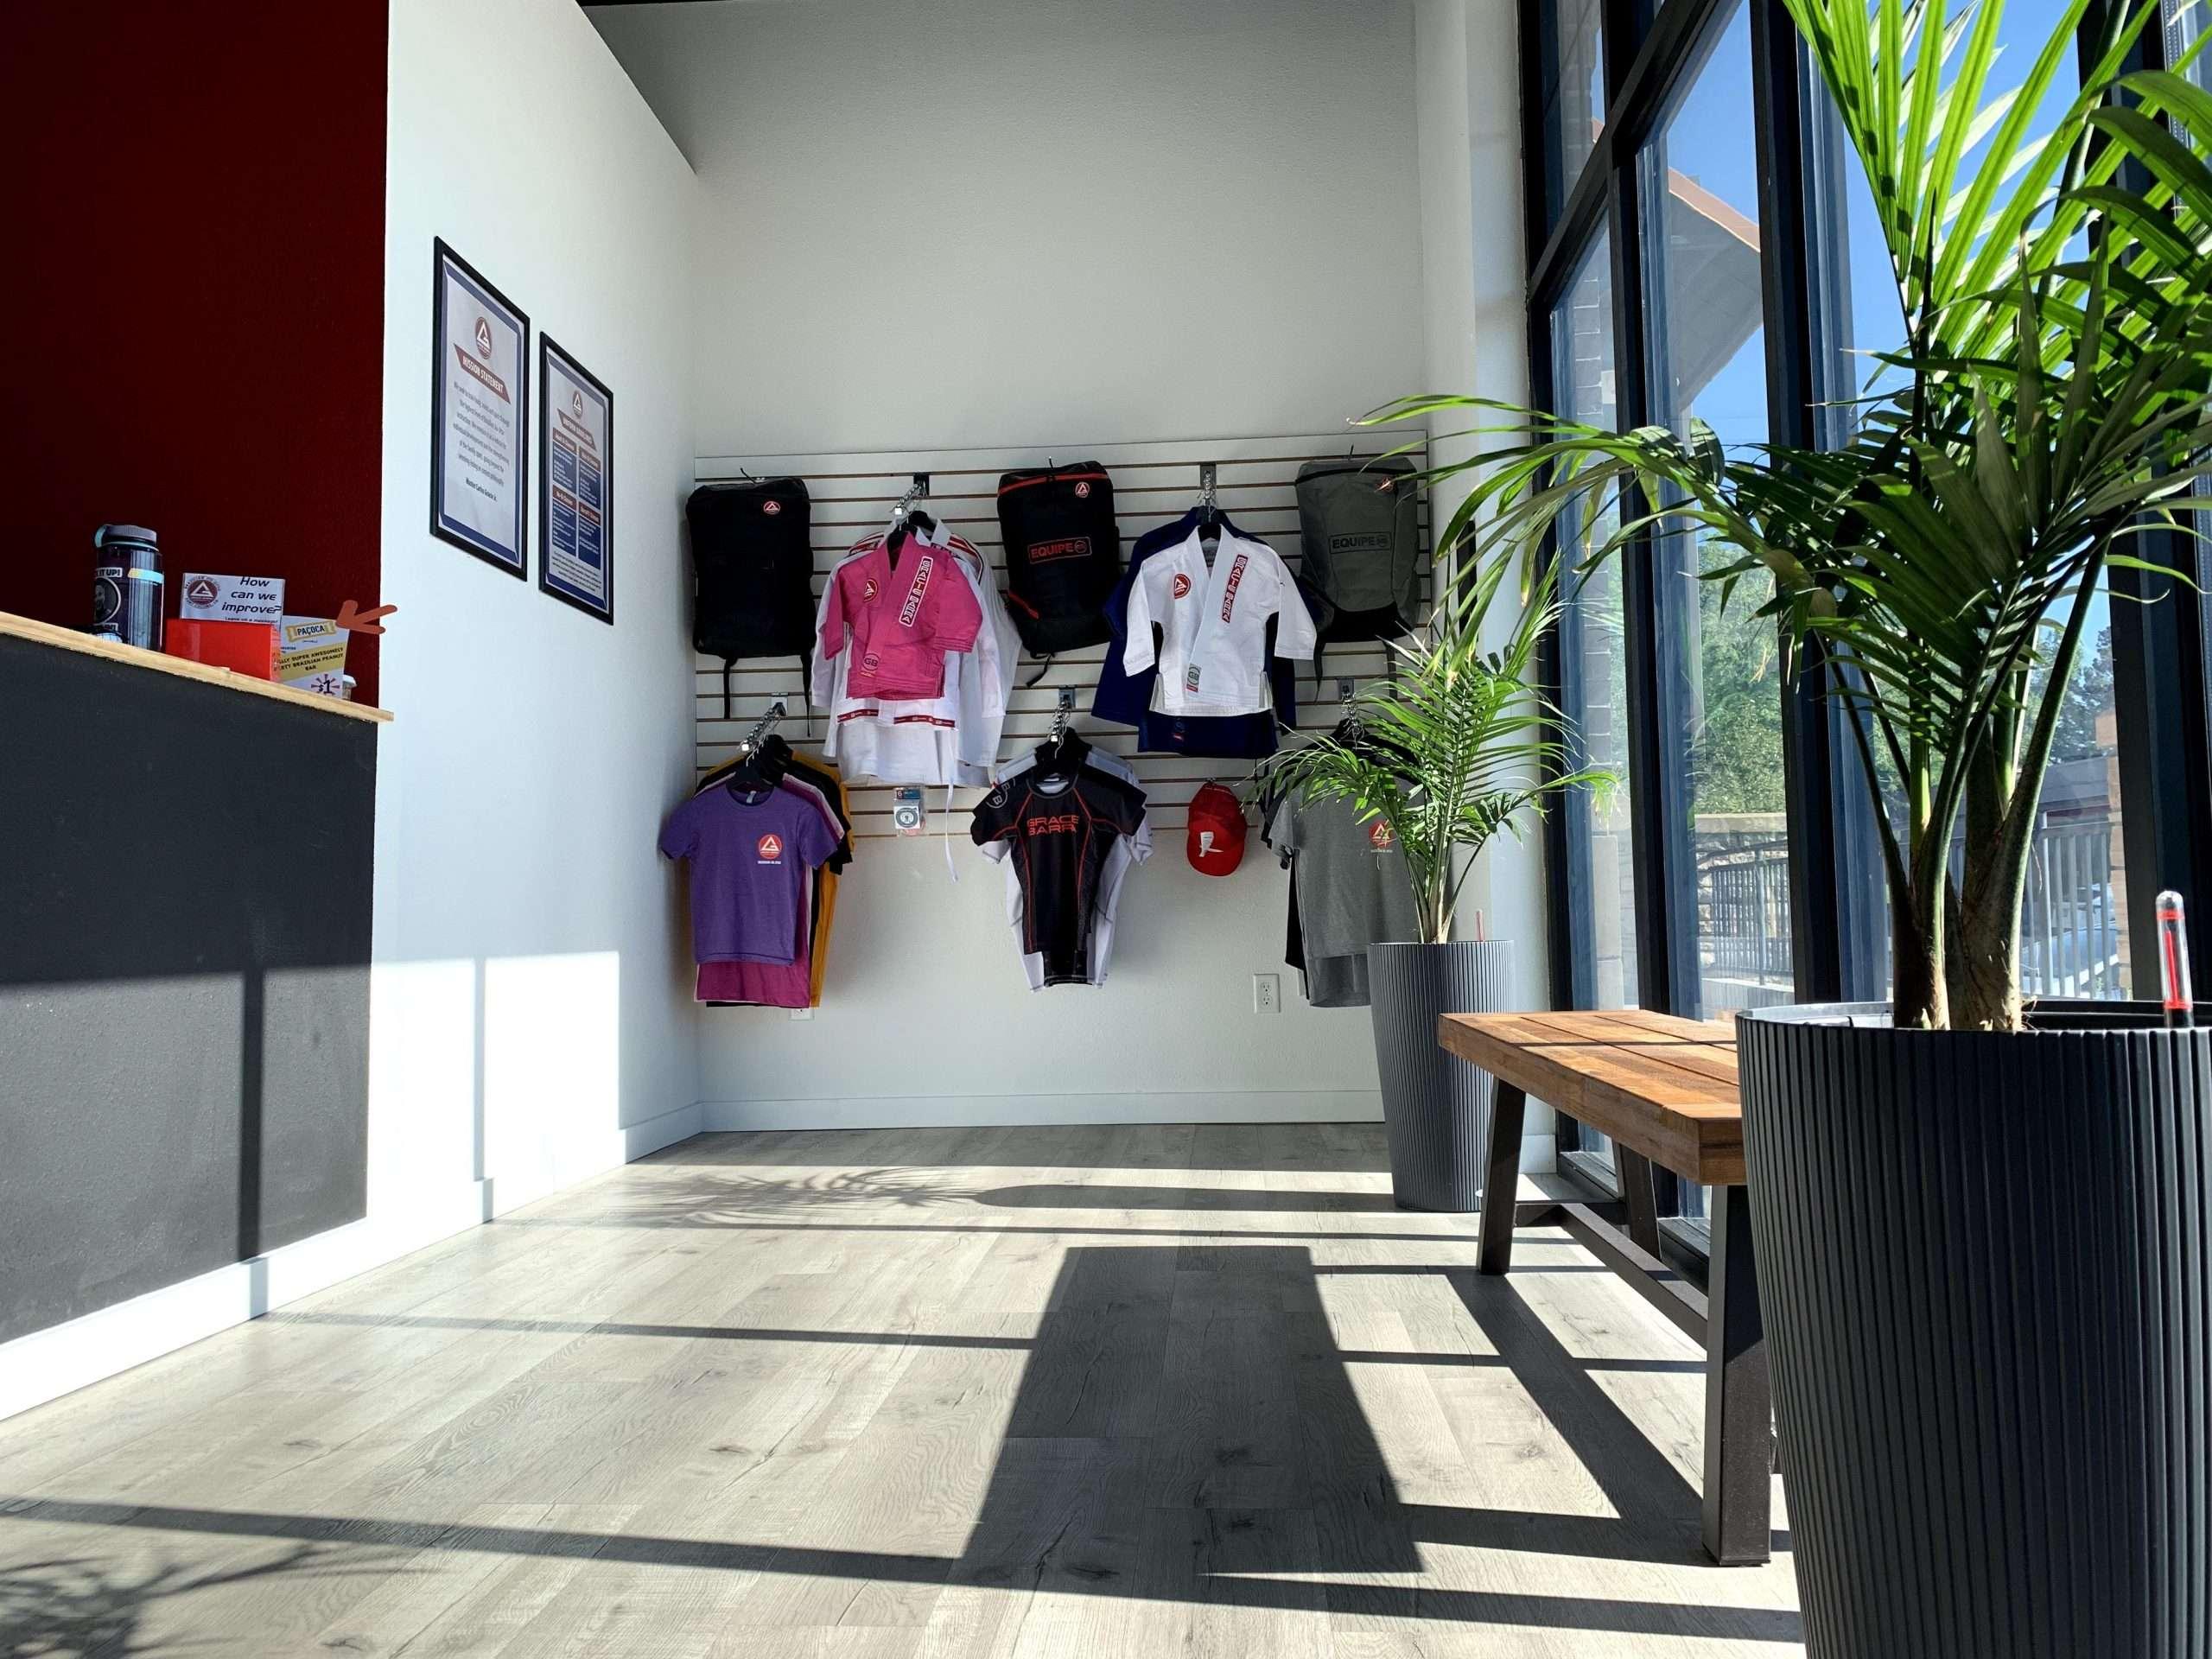 Gear shop inside Gracie Barra Fort Collins